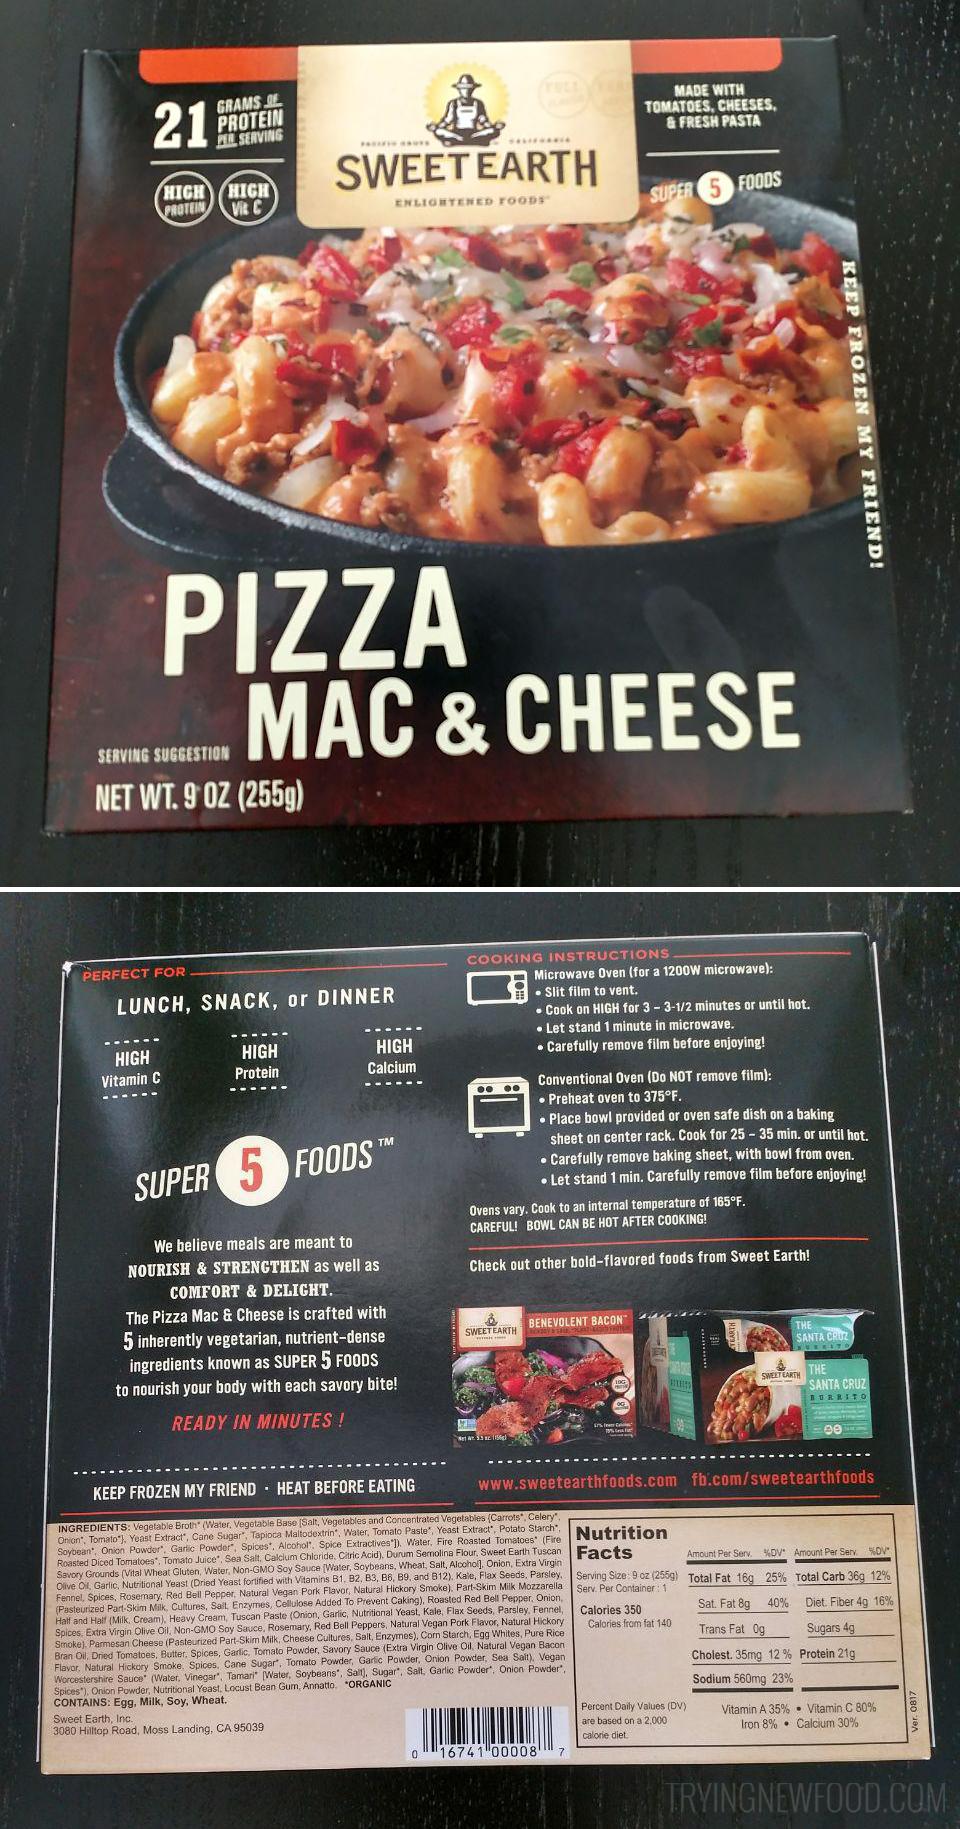 Sweet Earth Pizza Mac & Cheese